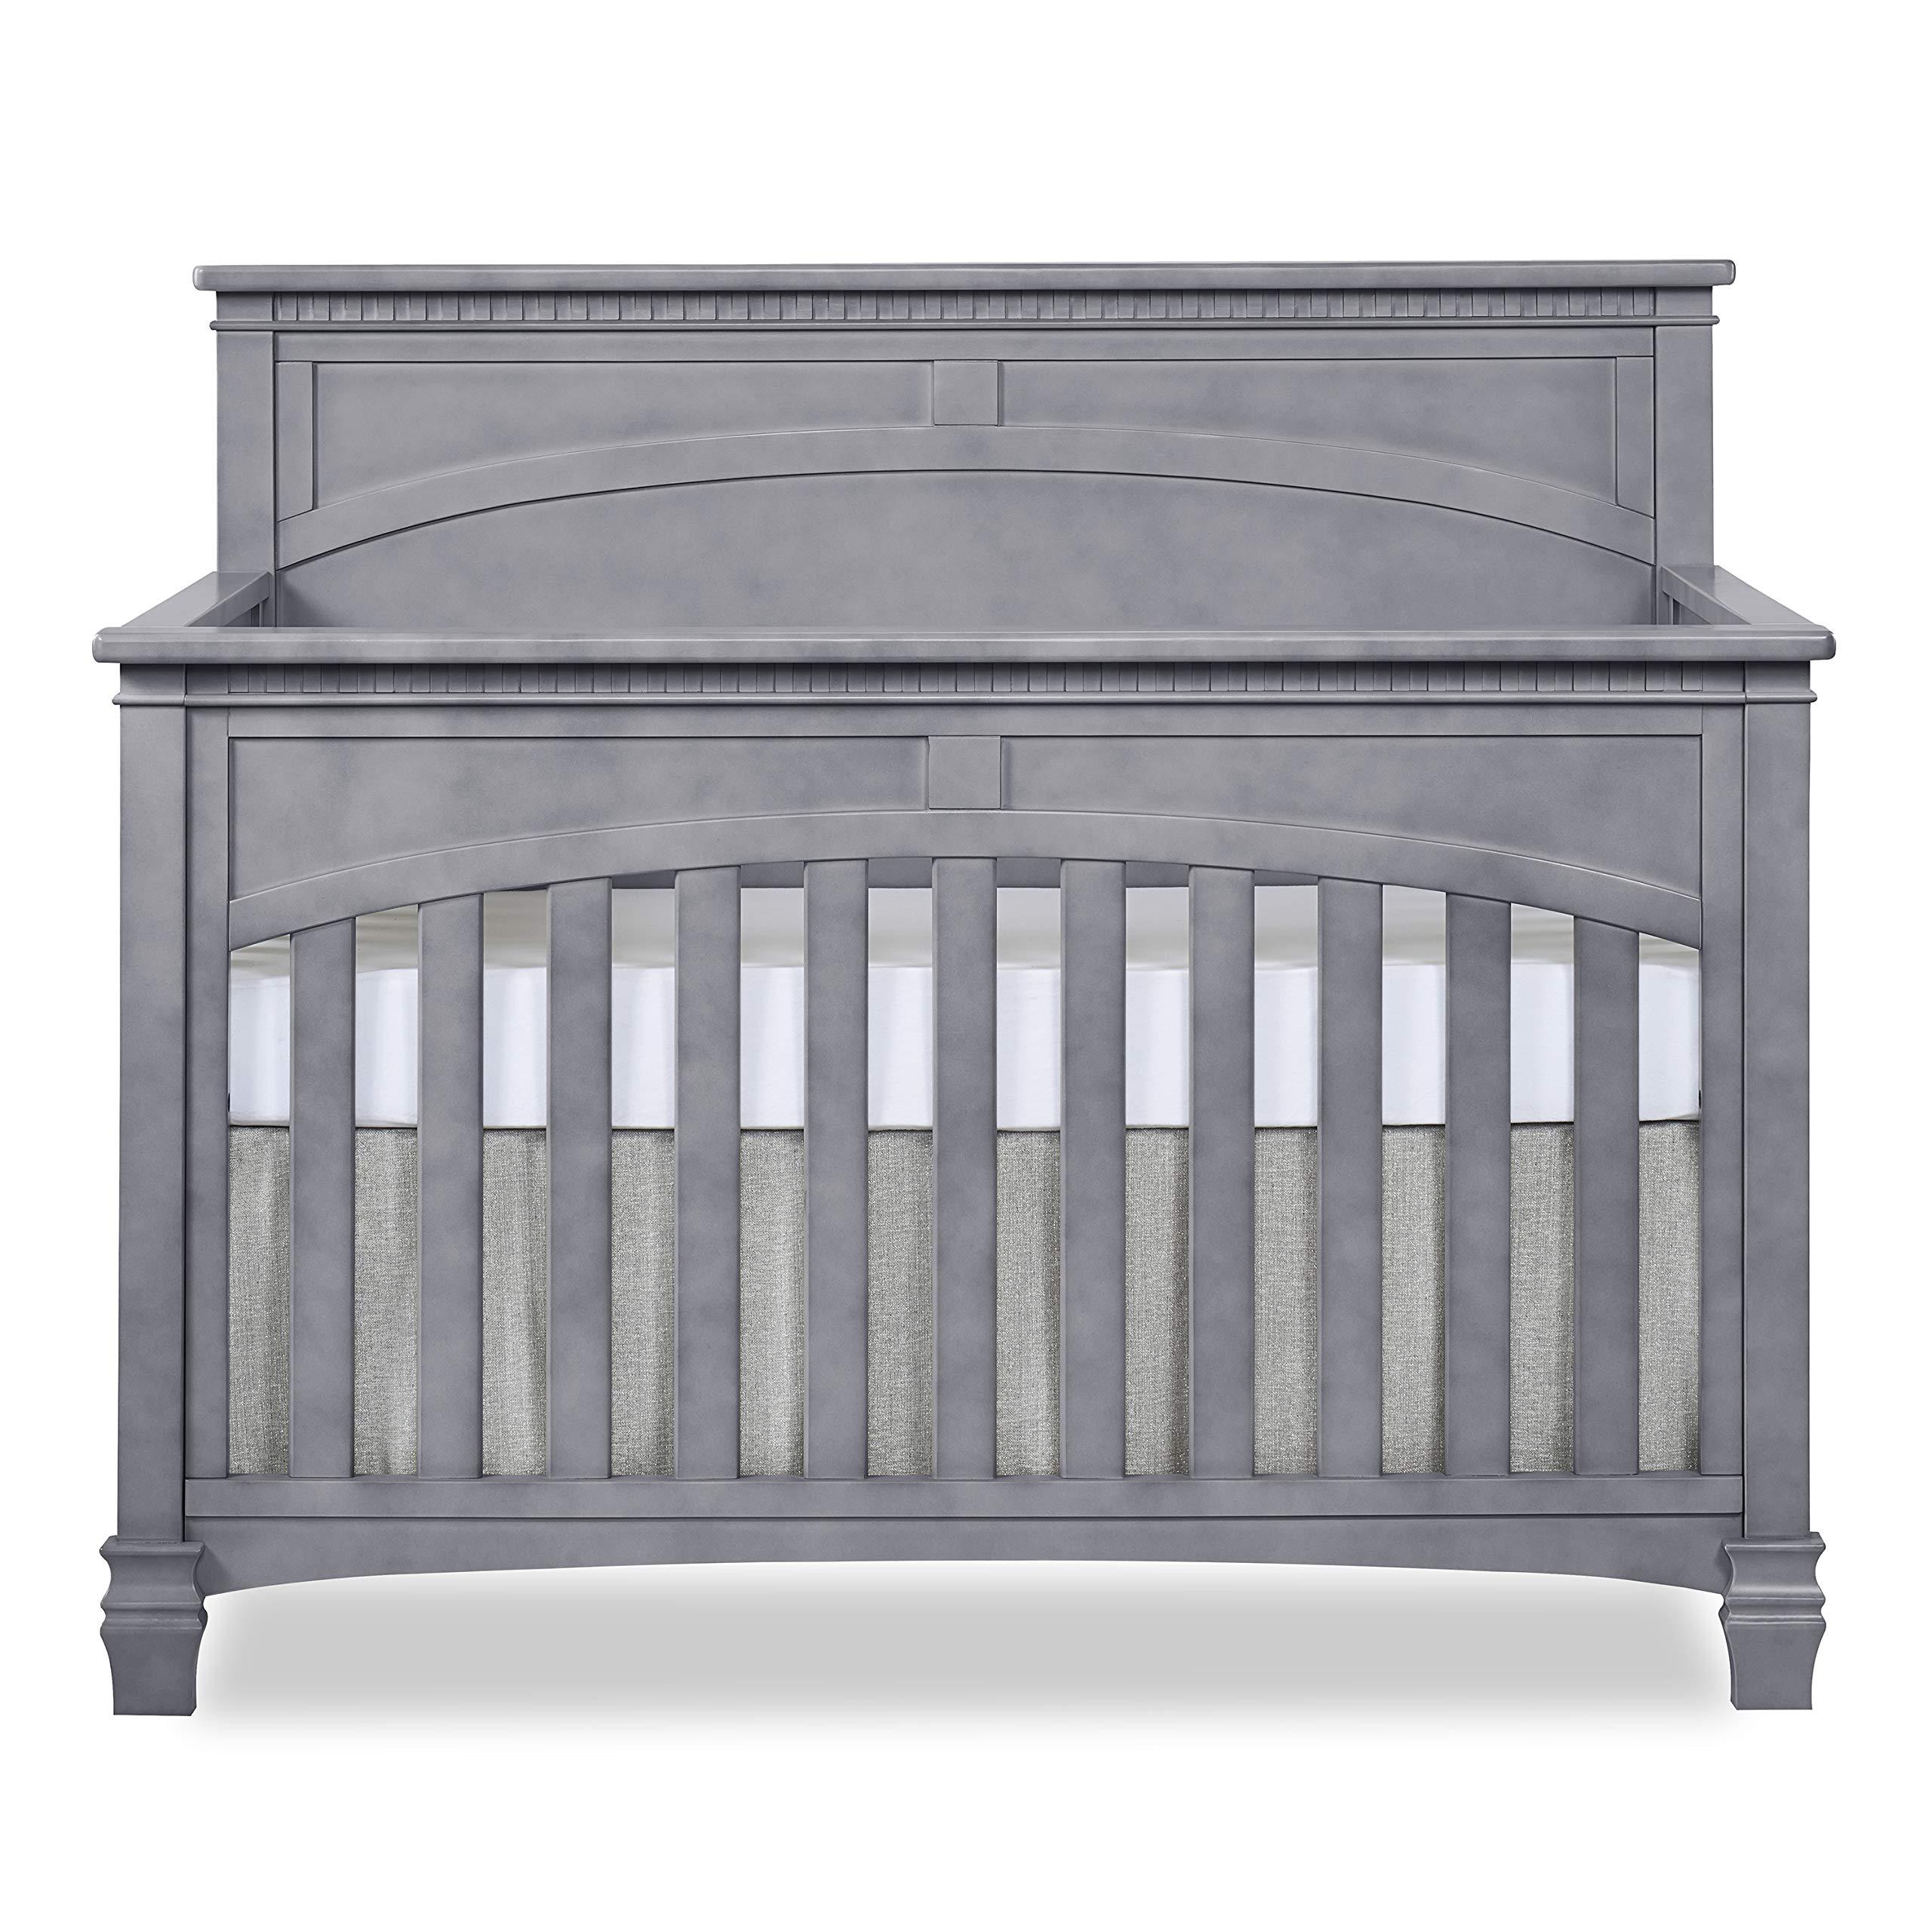 Evolur Santa Fe 5-in-1 Convertible Crib, Storm Grey by Evolur